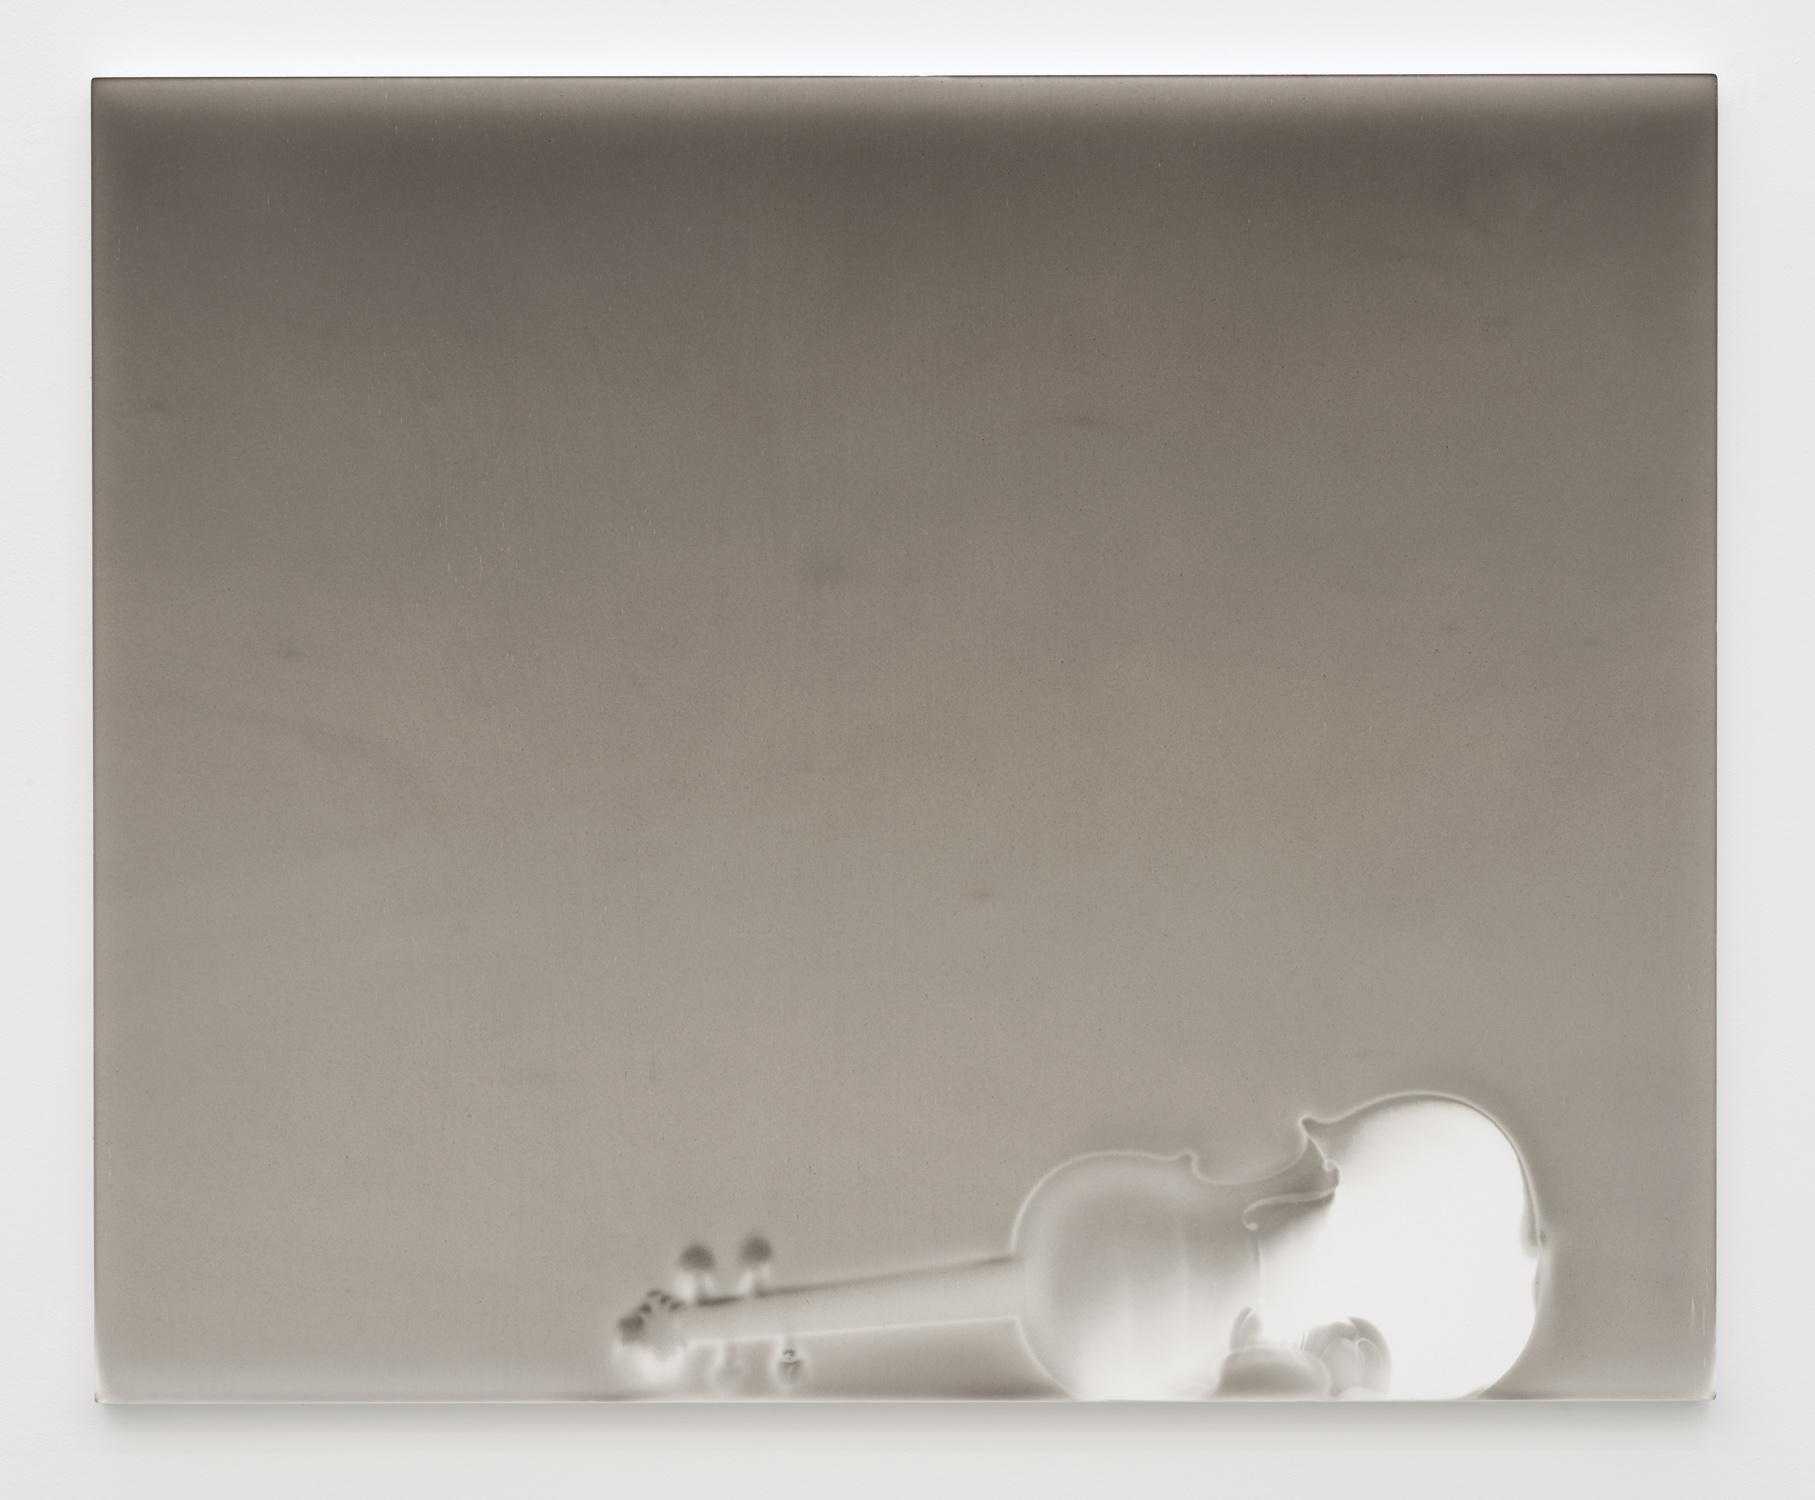 Parmiggiani, galleria Bortolami, sezione Generations